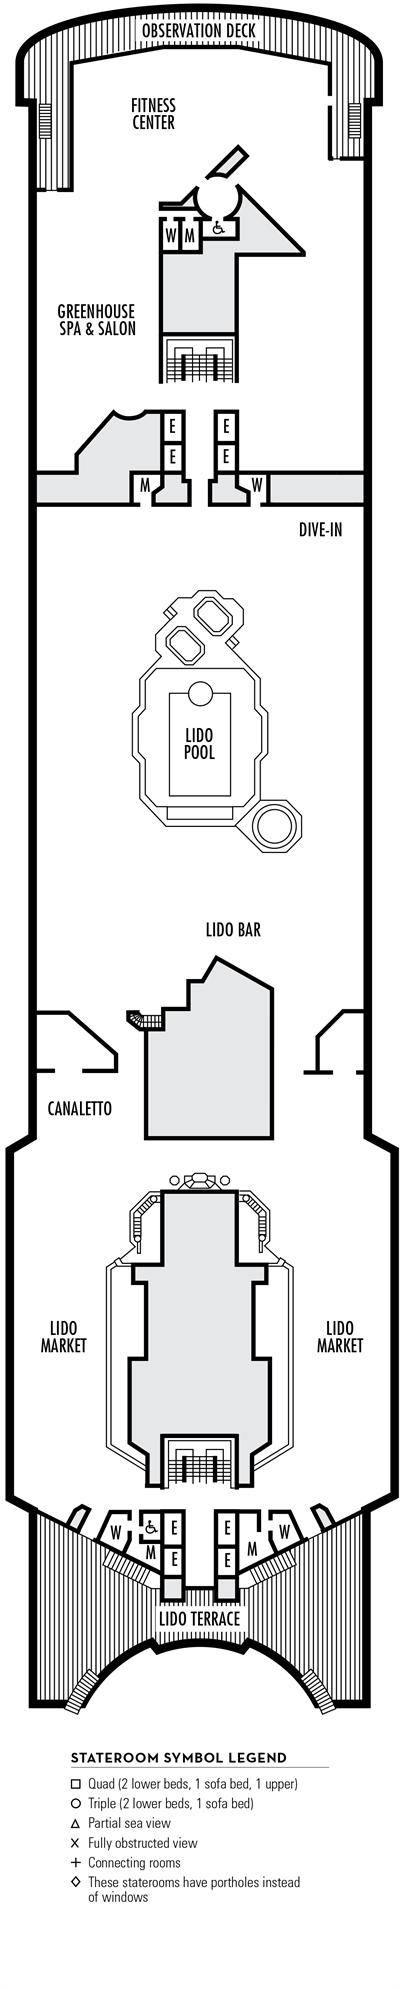 Deck 11 - HAL's Maasdam